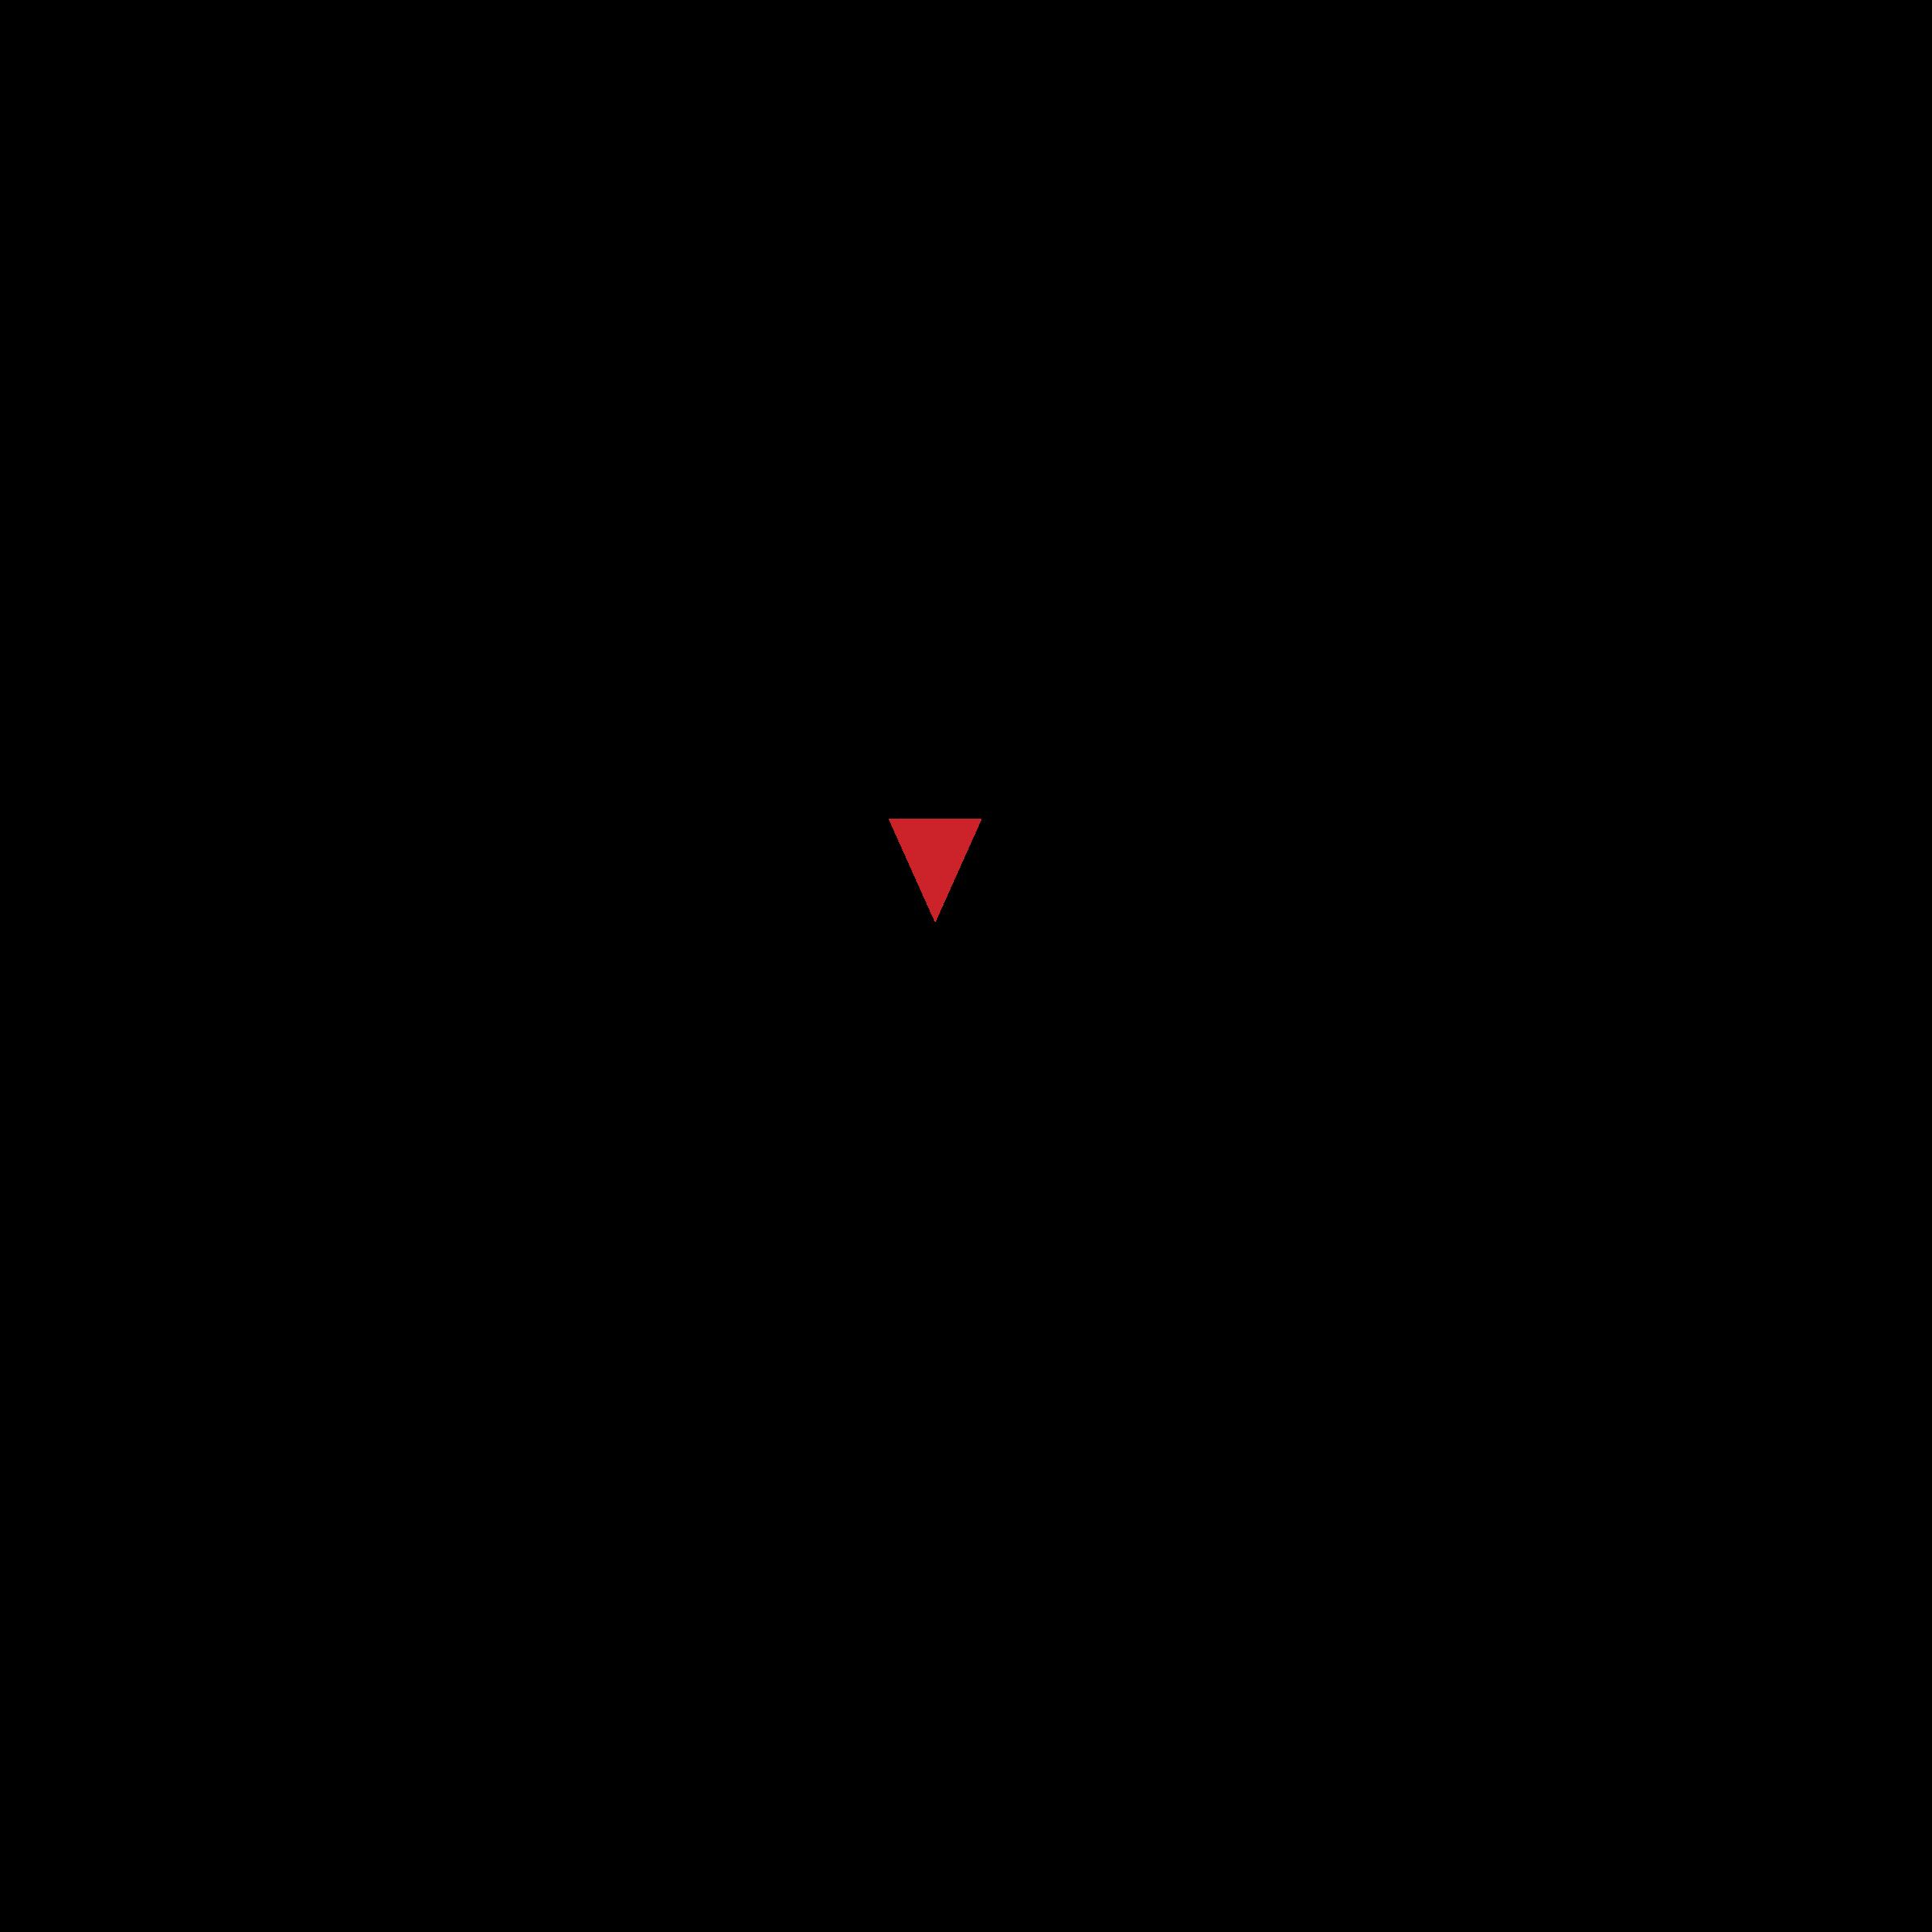 kenwood-2-logo-png-transparent